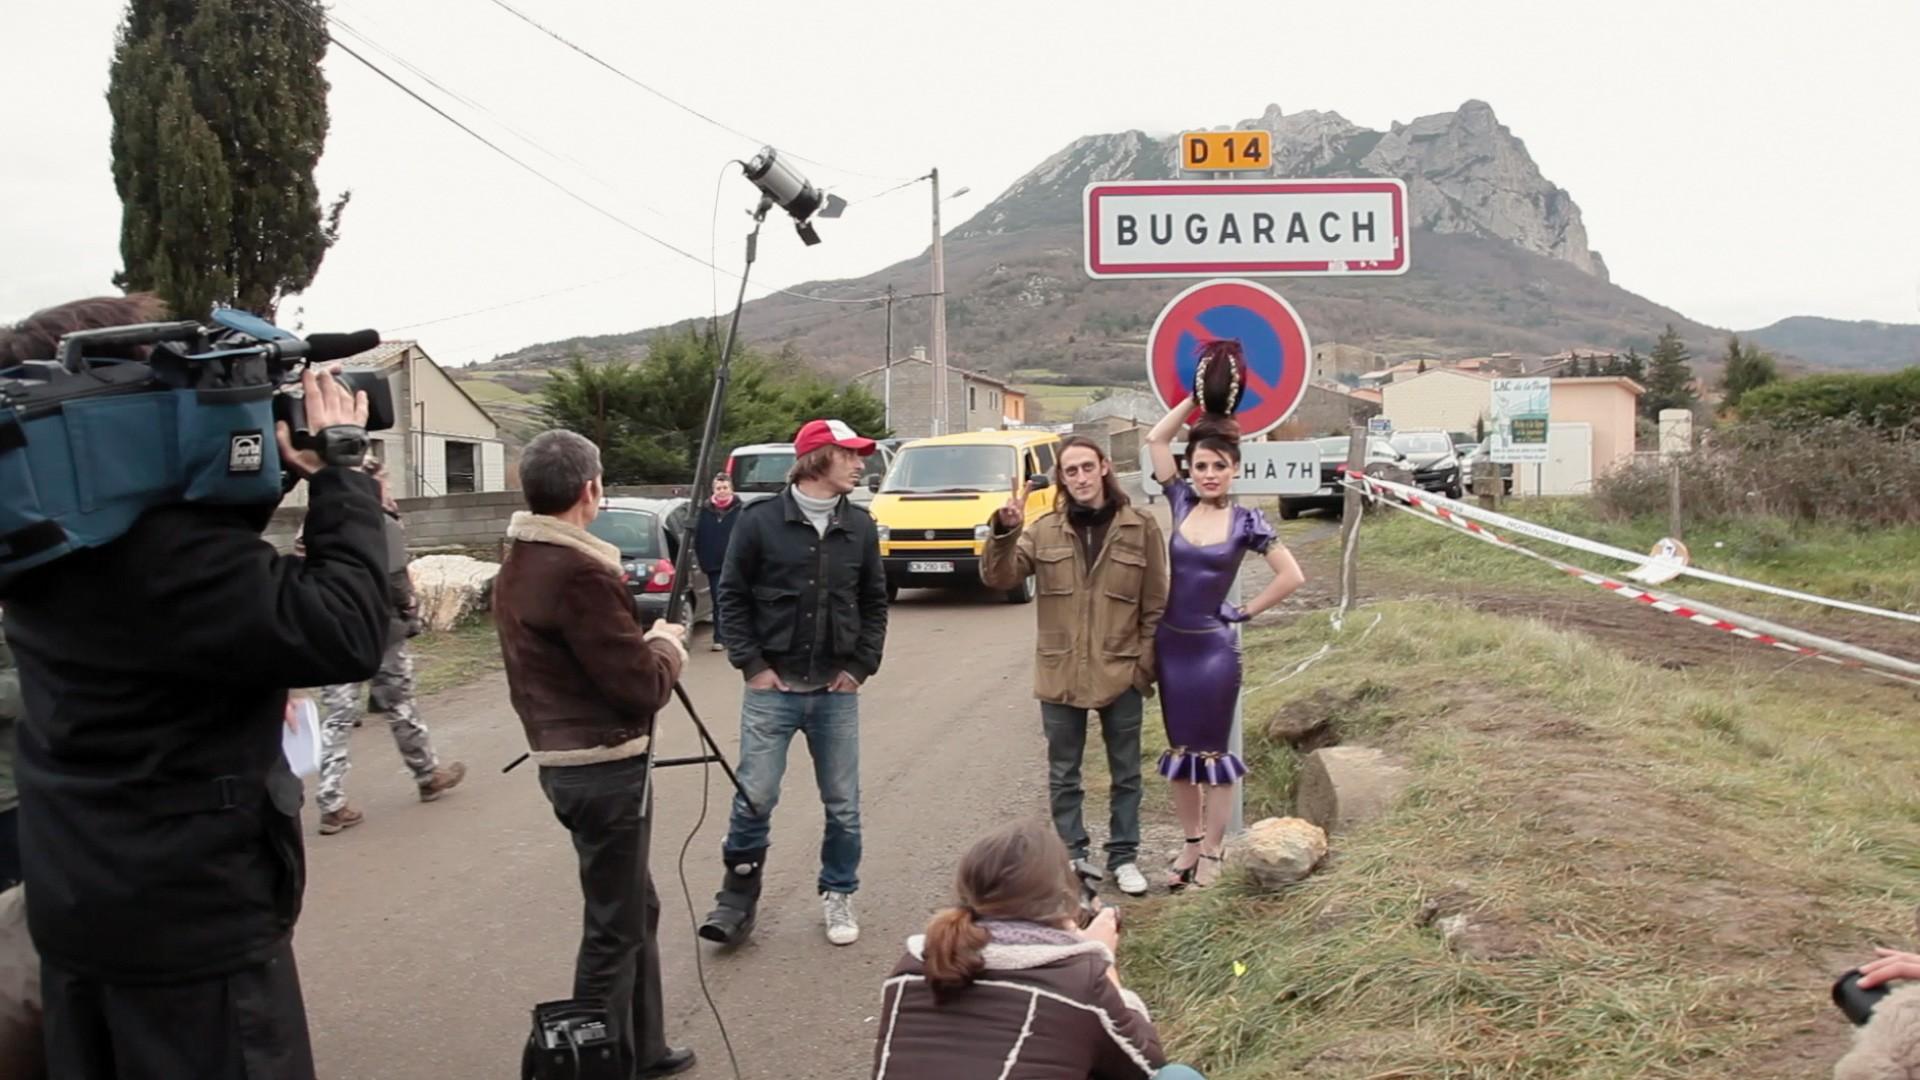 Bugarach-1